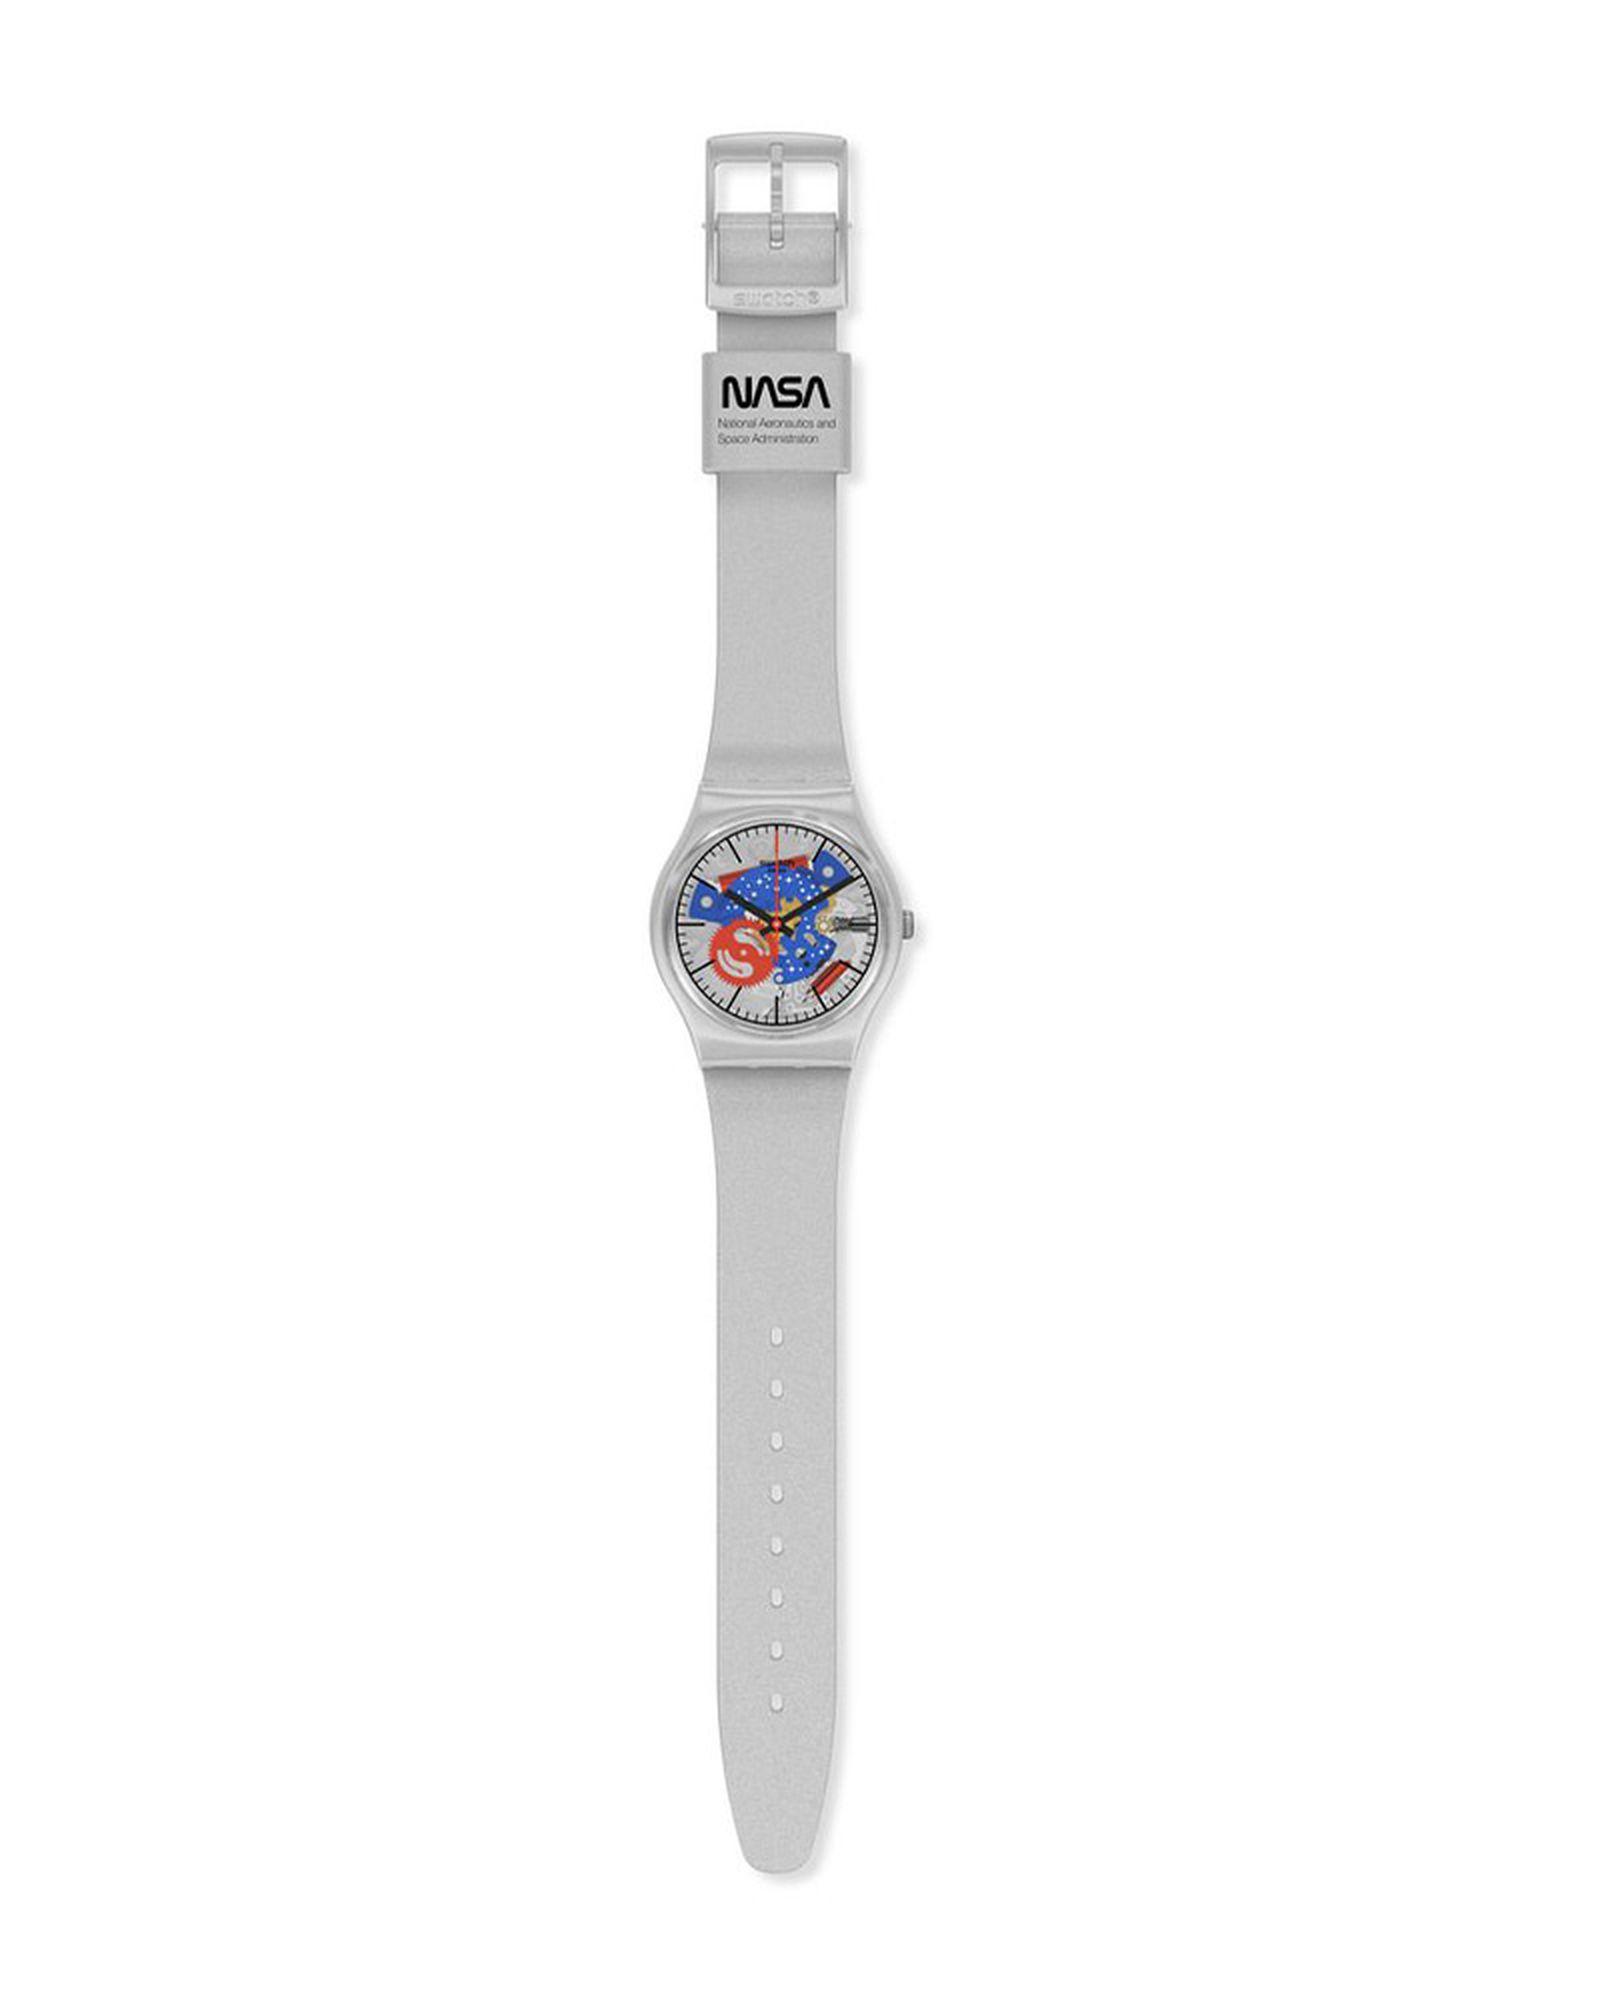 swatch-nasa-watch-01